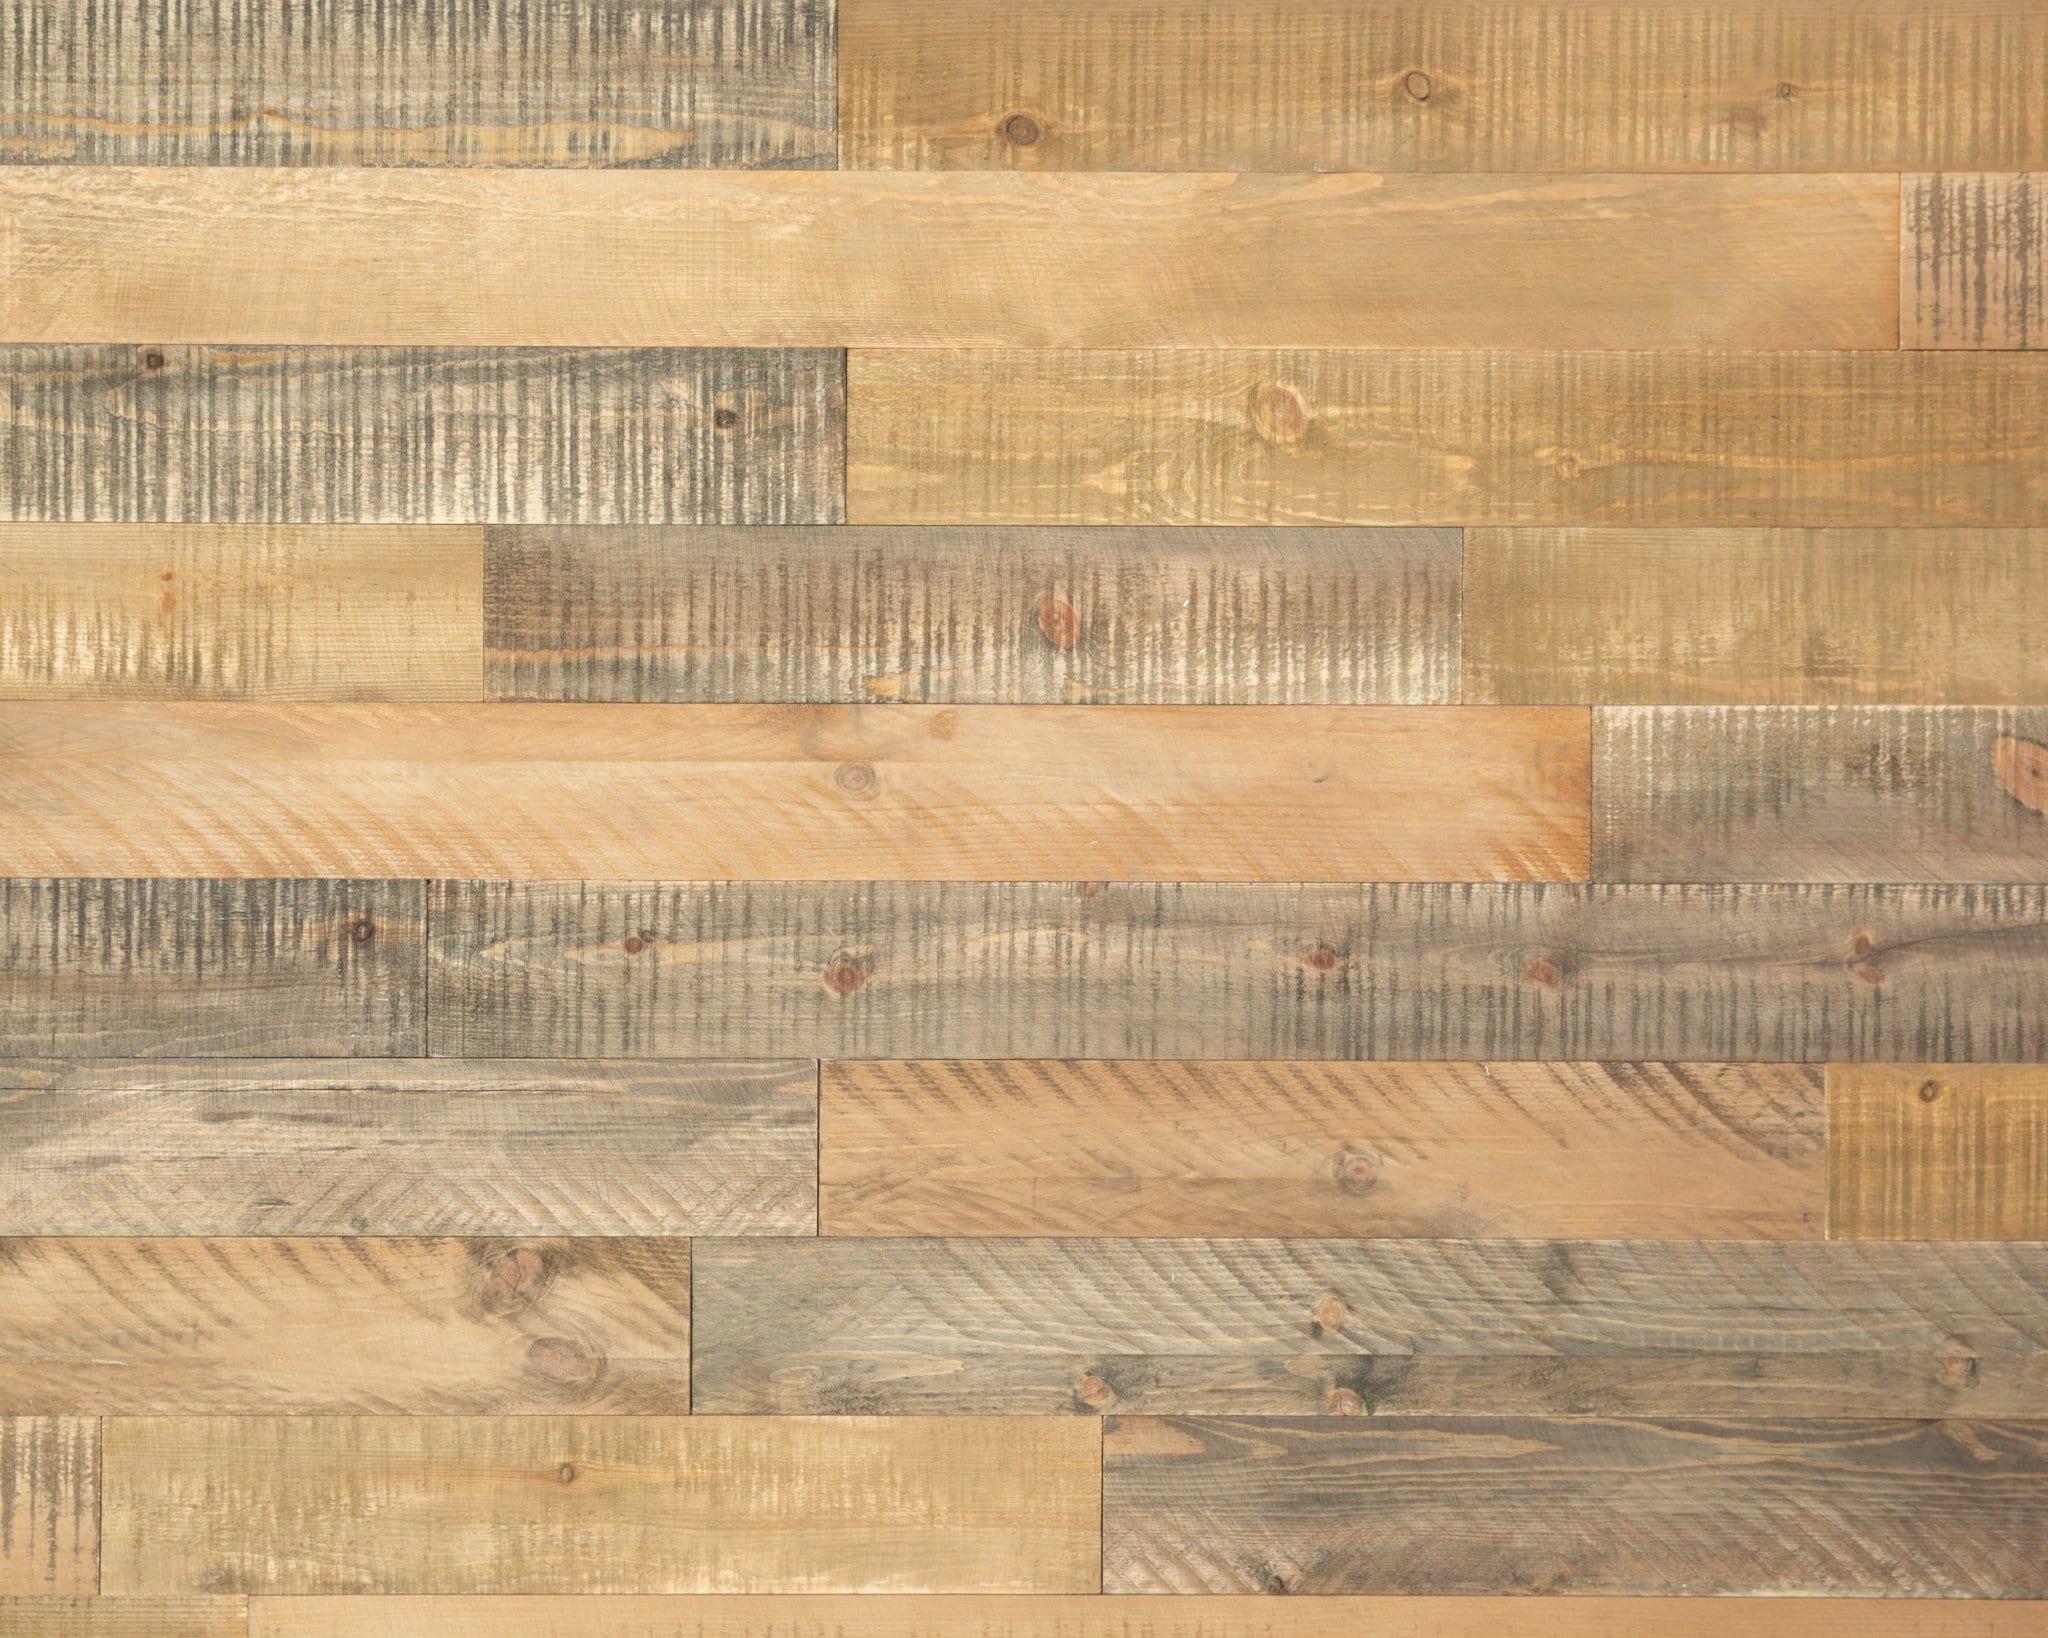 Naturewall Peel and Stick Wood Wall Panels 1m2 Packs | Etsy